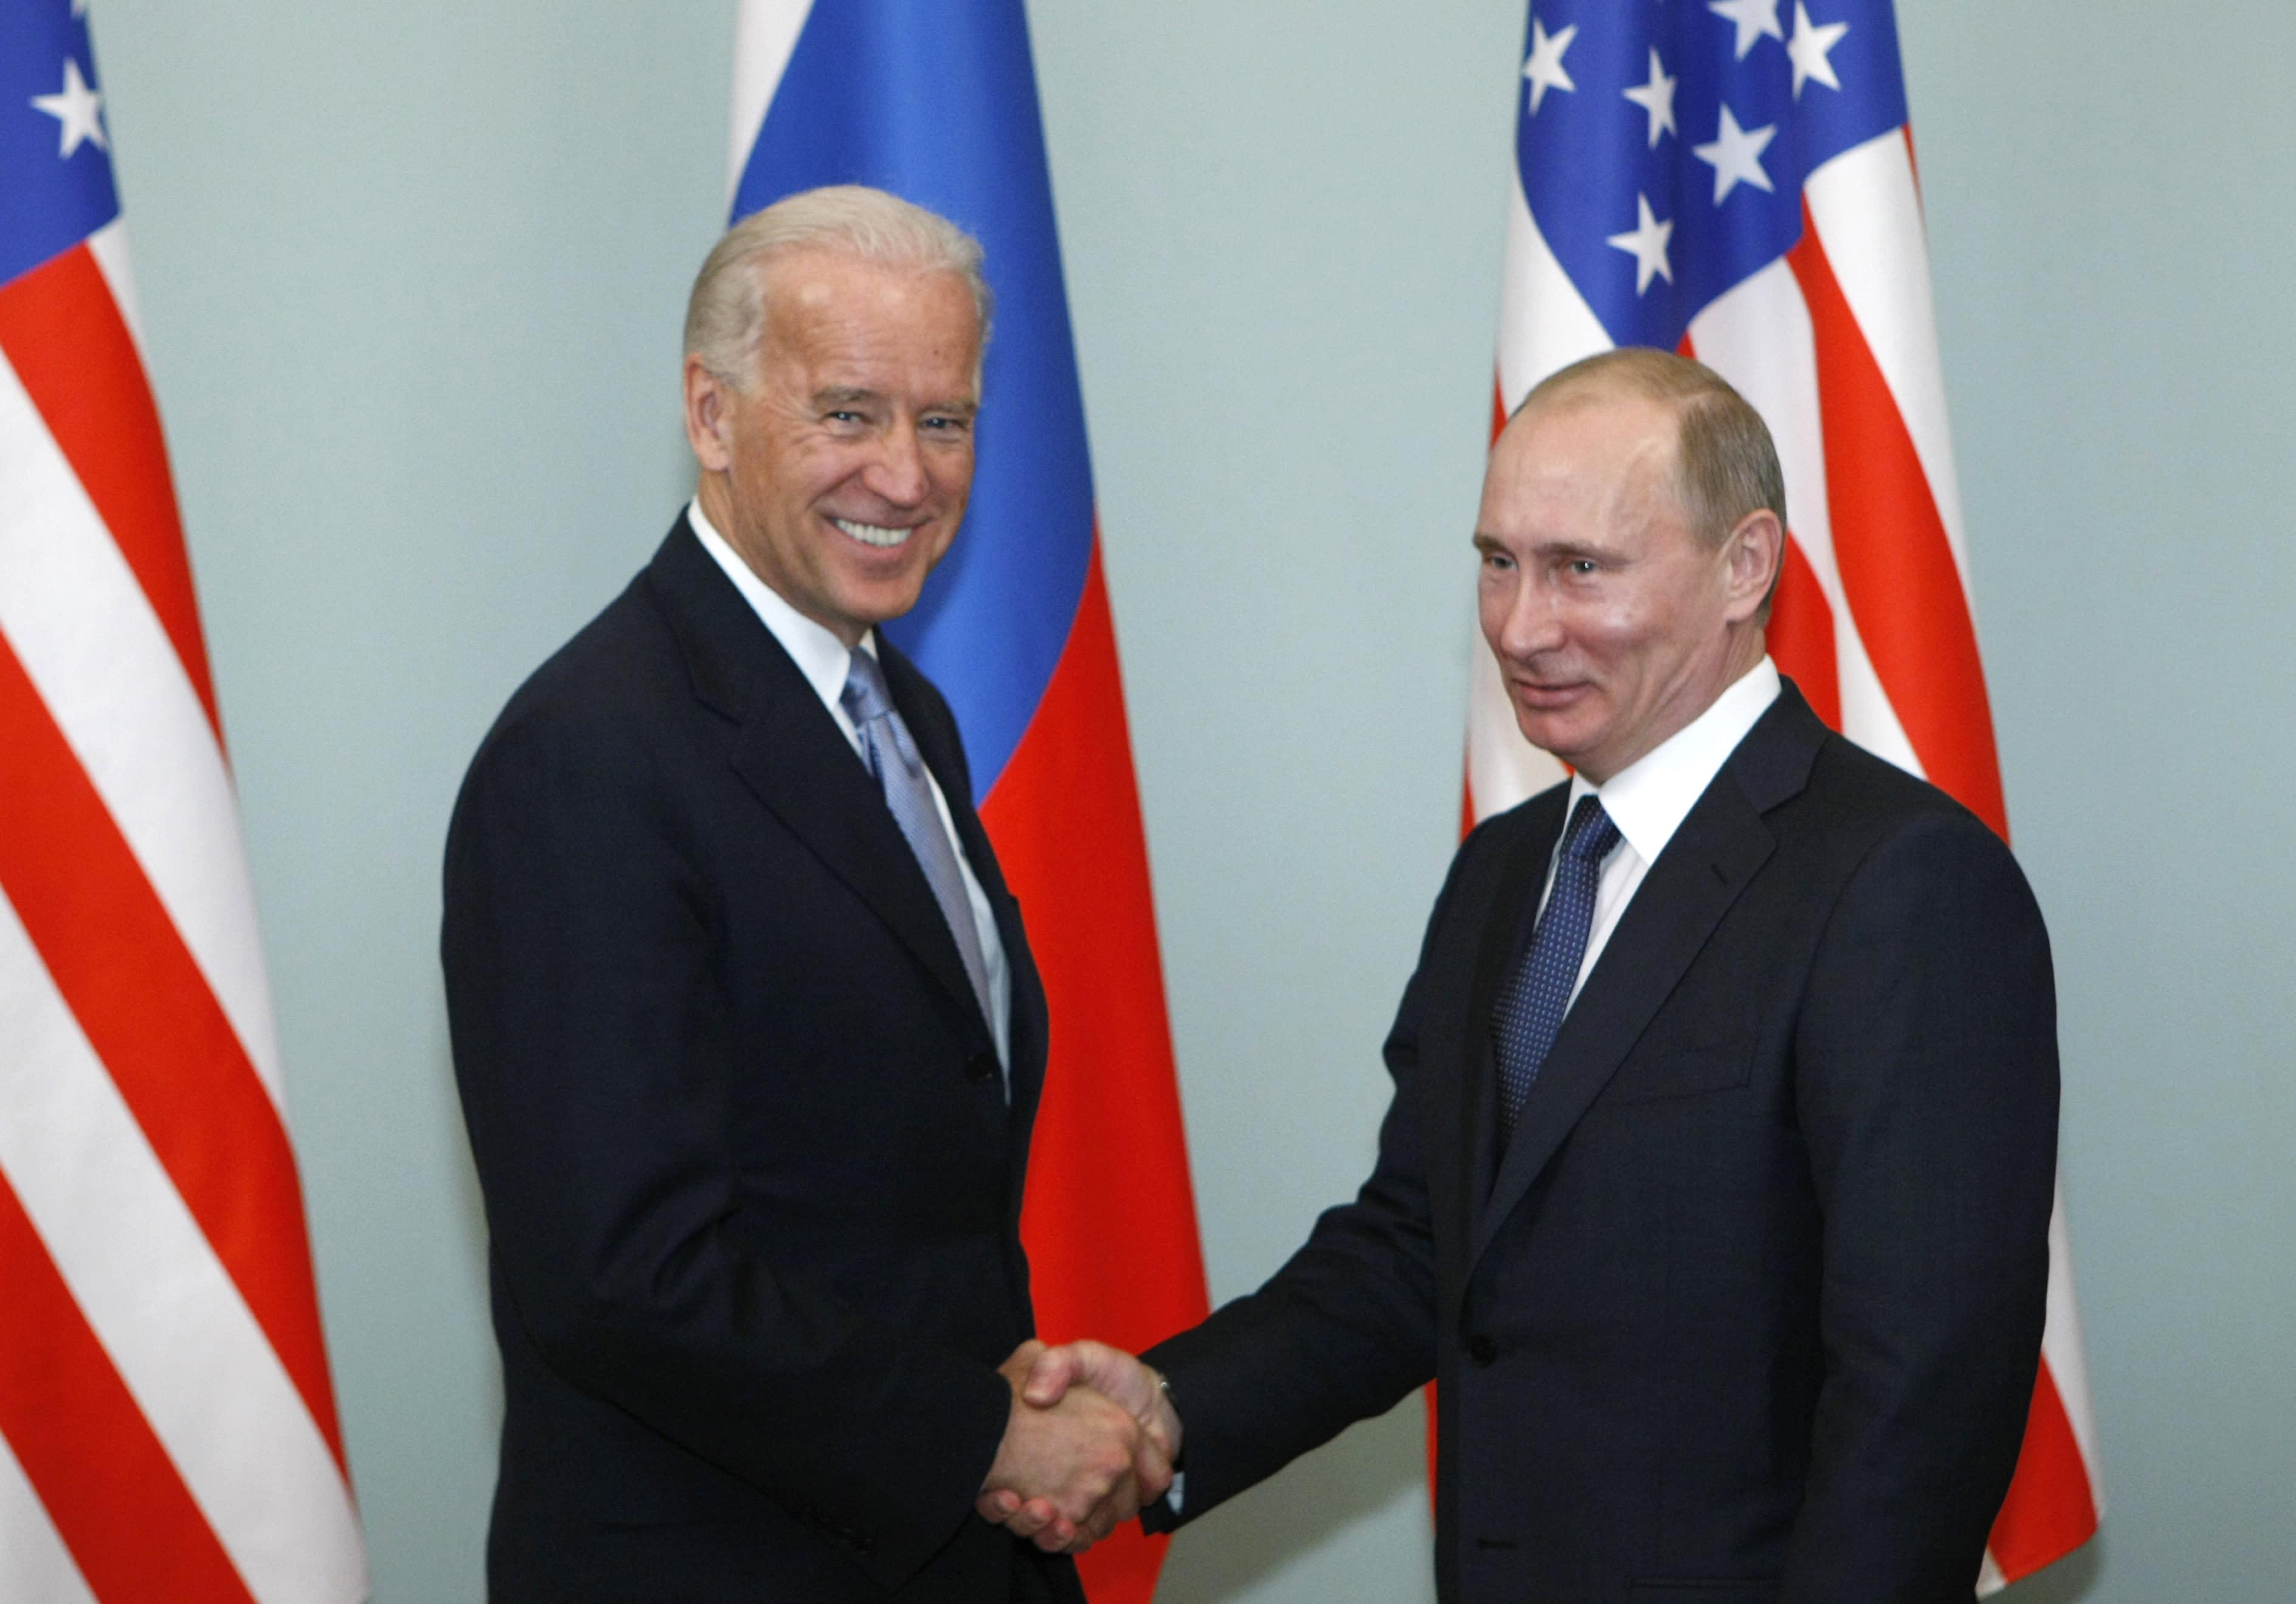 Arms deal, hacking complicate Joe Biden's approach to Russia